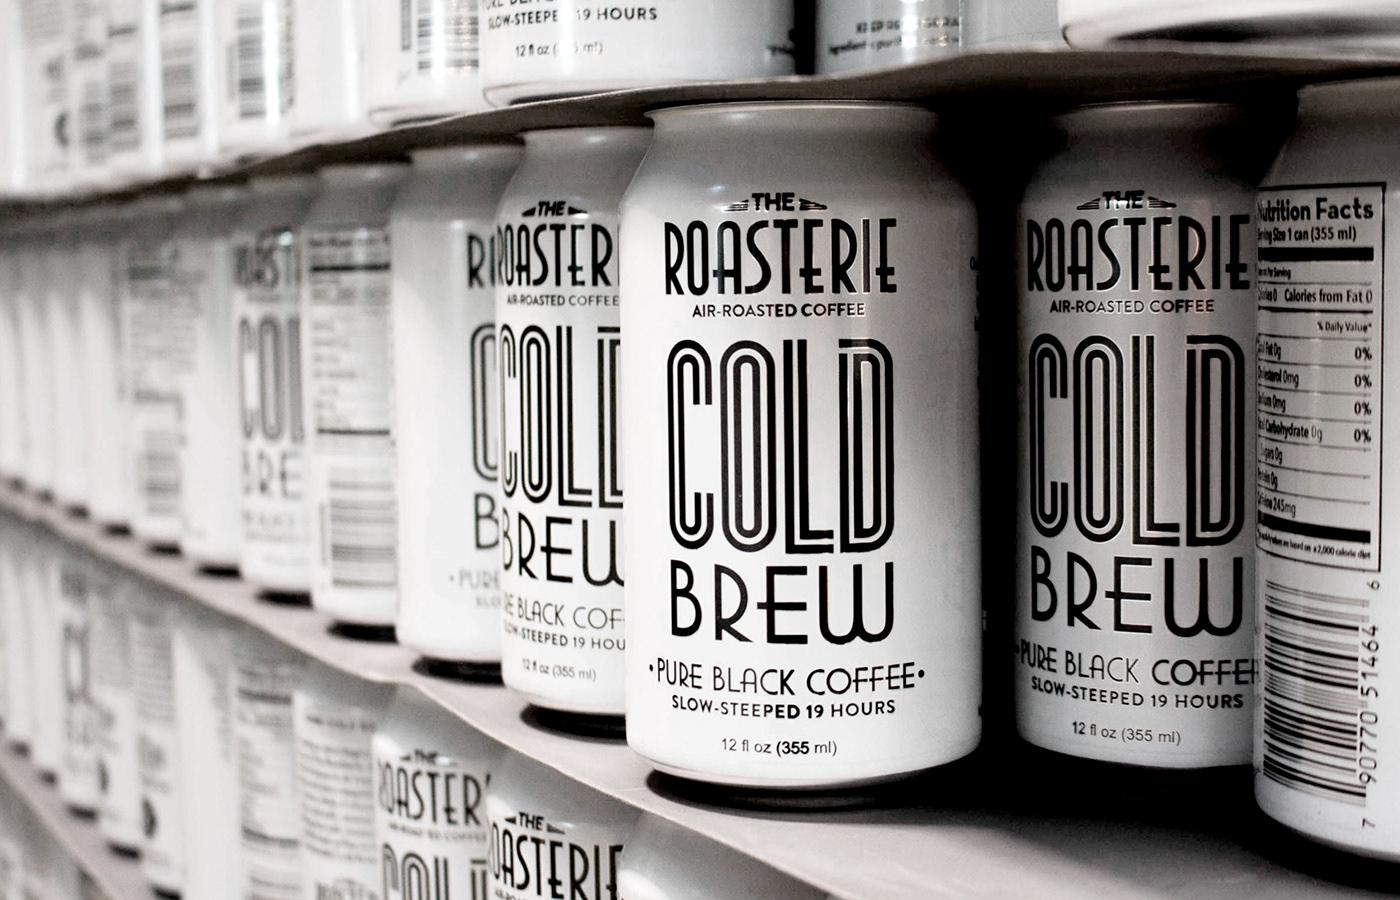 Coffee coffee packaging coffee branding coffee company packaging design branding  Cold Brew Cold Brew Coffee The Roasterie Coffee Design